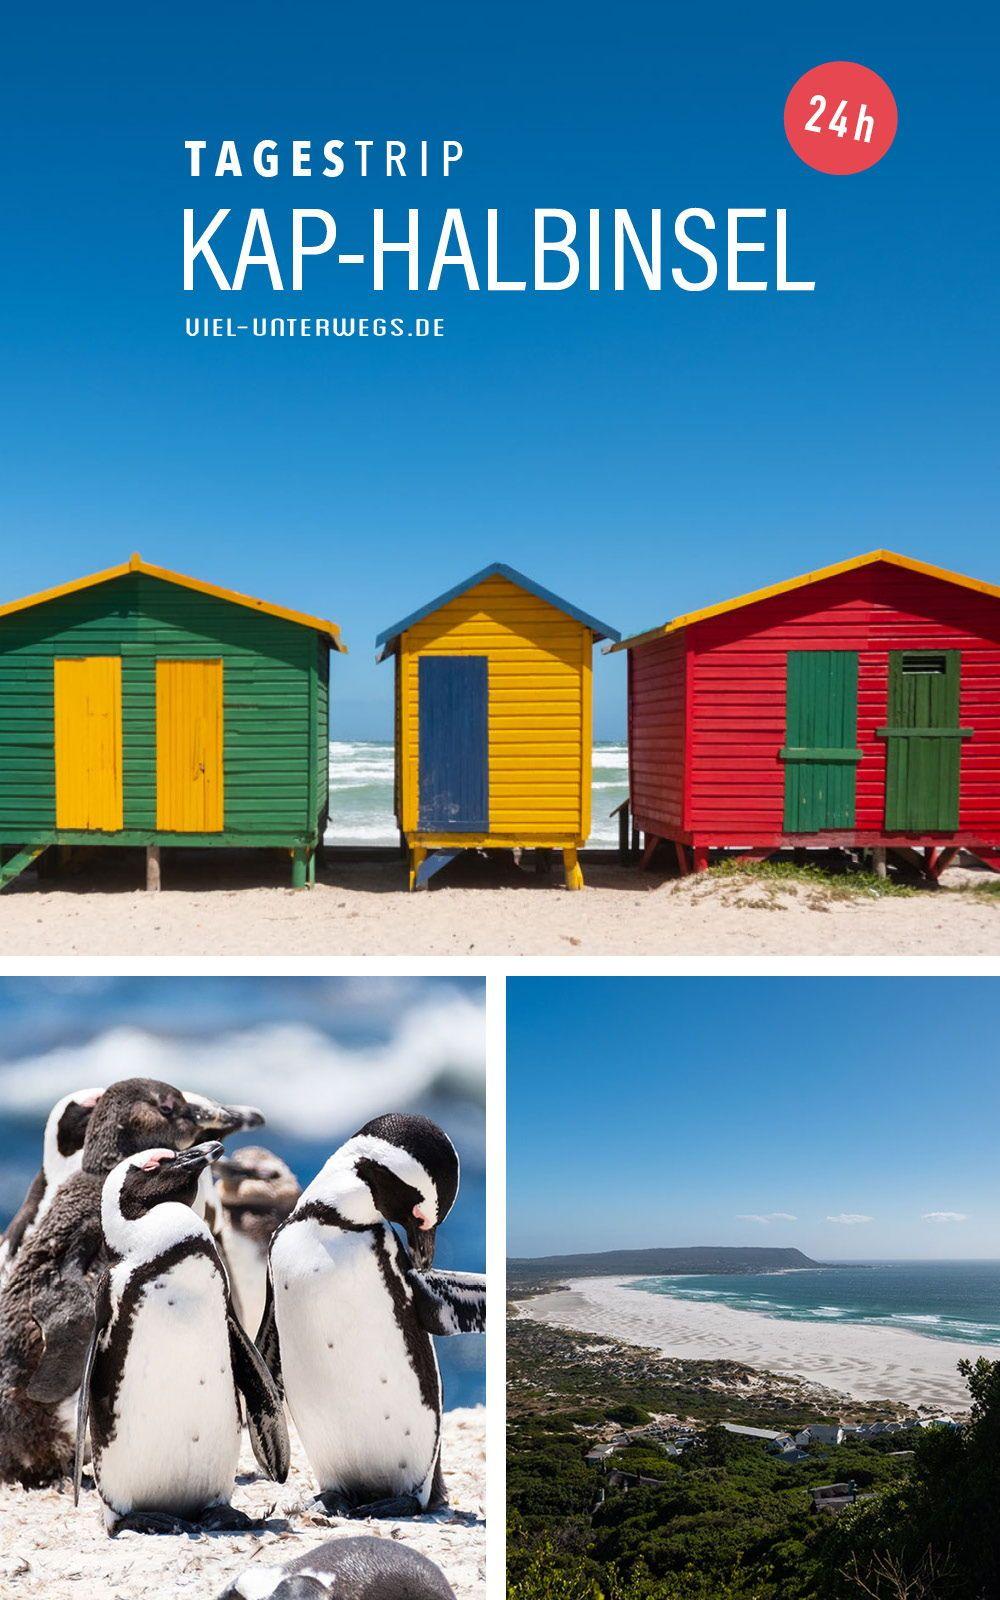 Kap der Guten Hoffung & Kap-Halbinsel an einem Tag